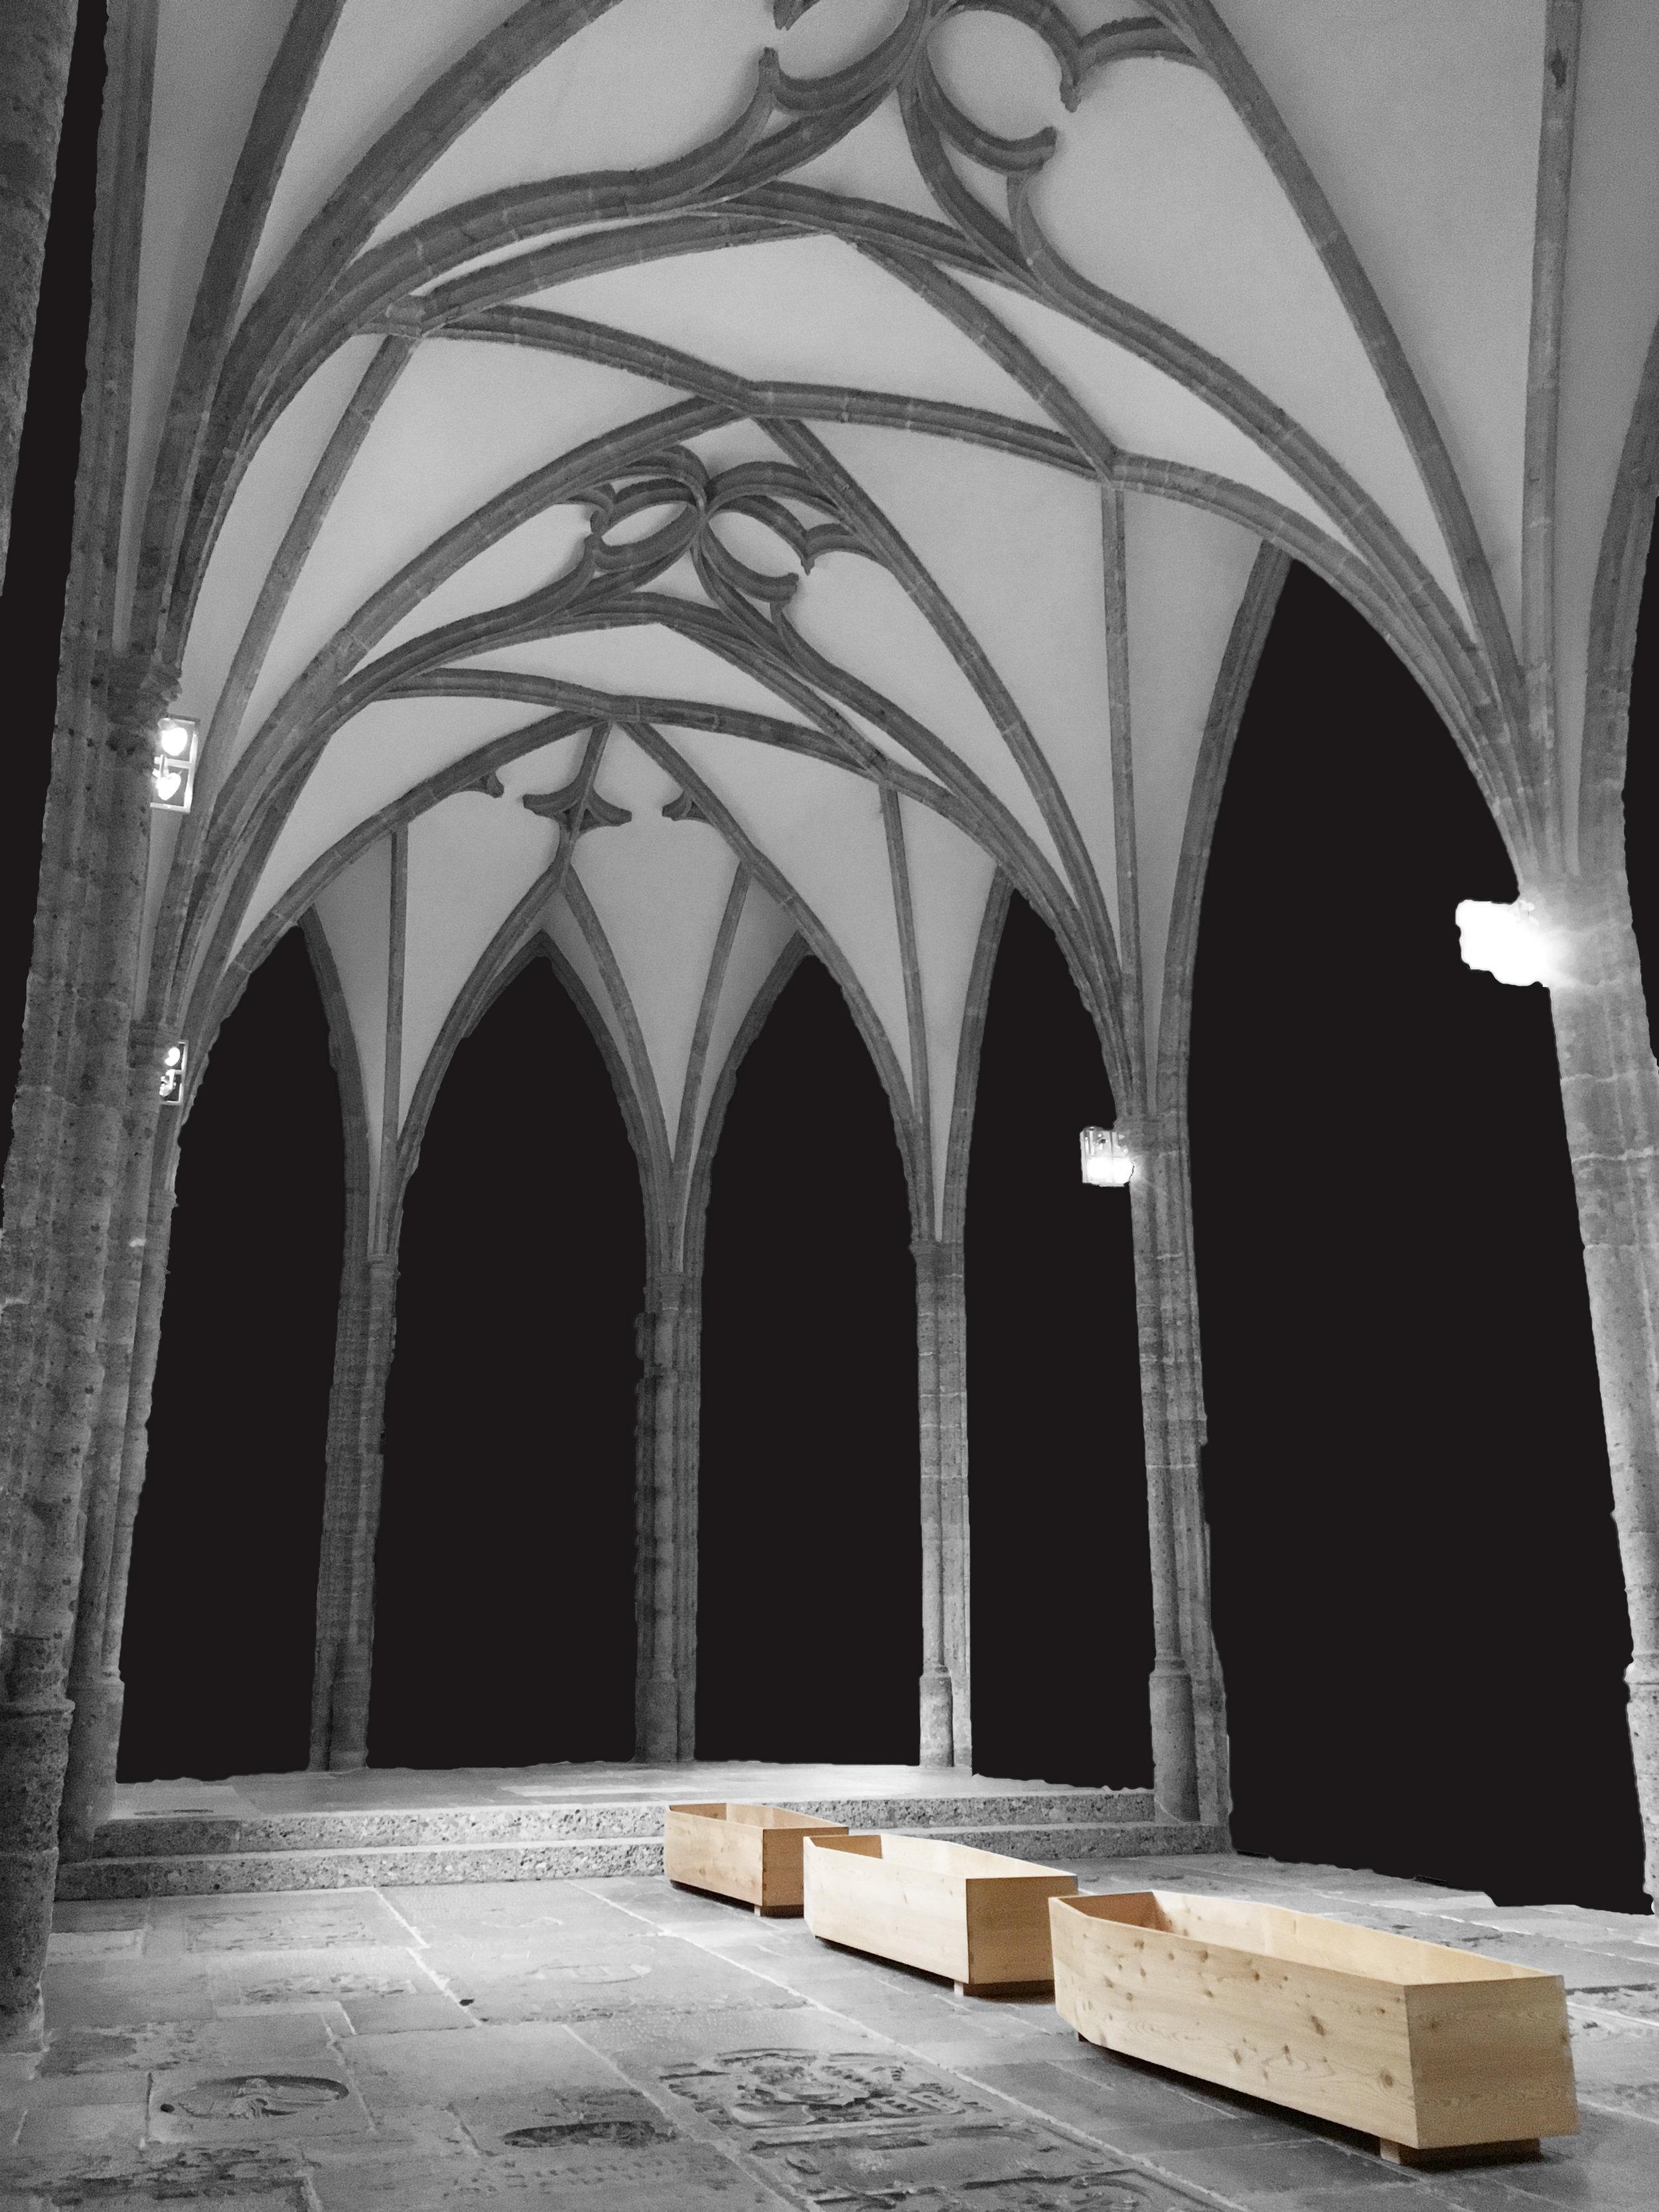 visualisierung in.szene.setzung margarethen.kapelle